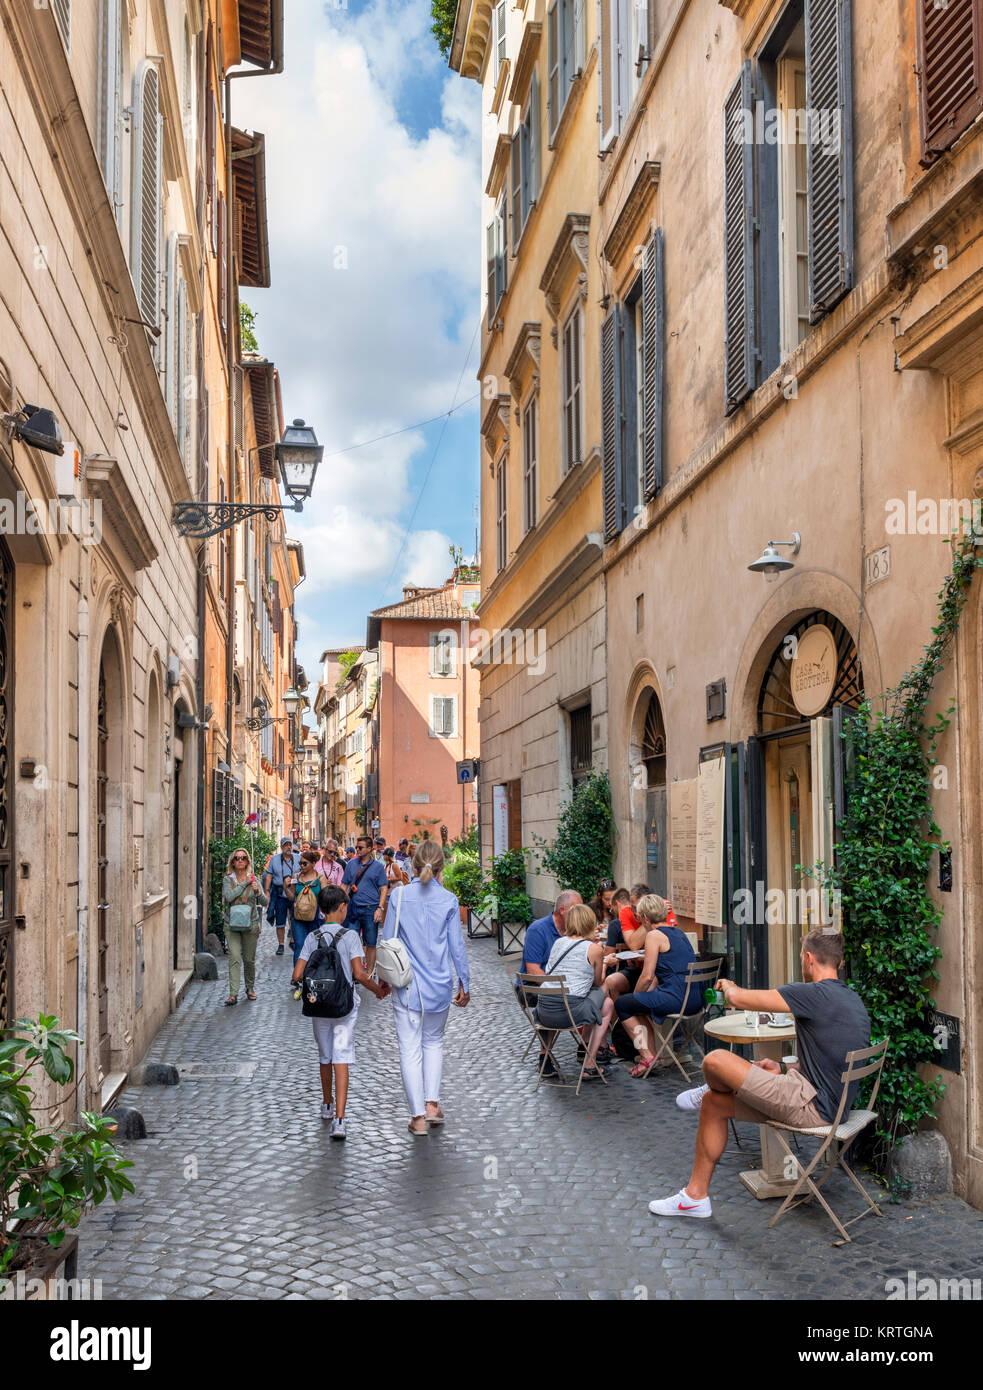 Sidewalk cafe on Via dei Coronari in the centro storico, Rome, Italy - Stock Image